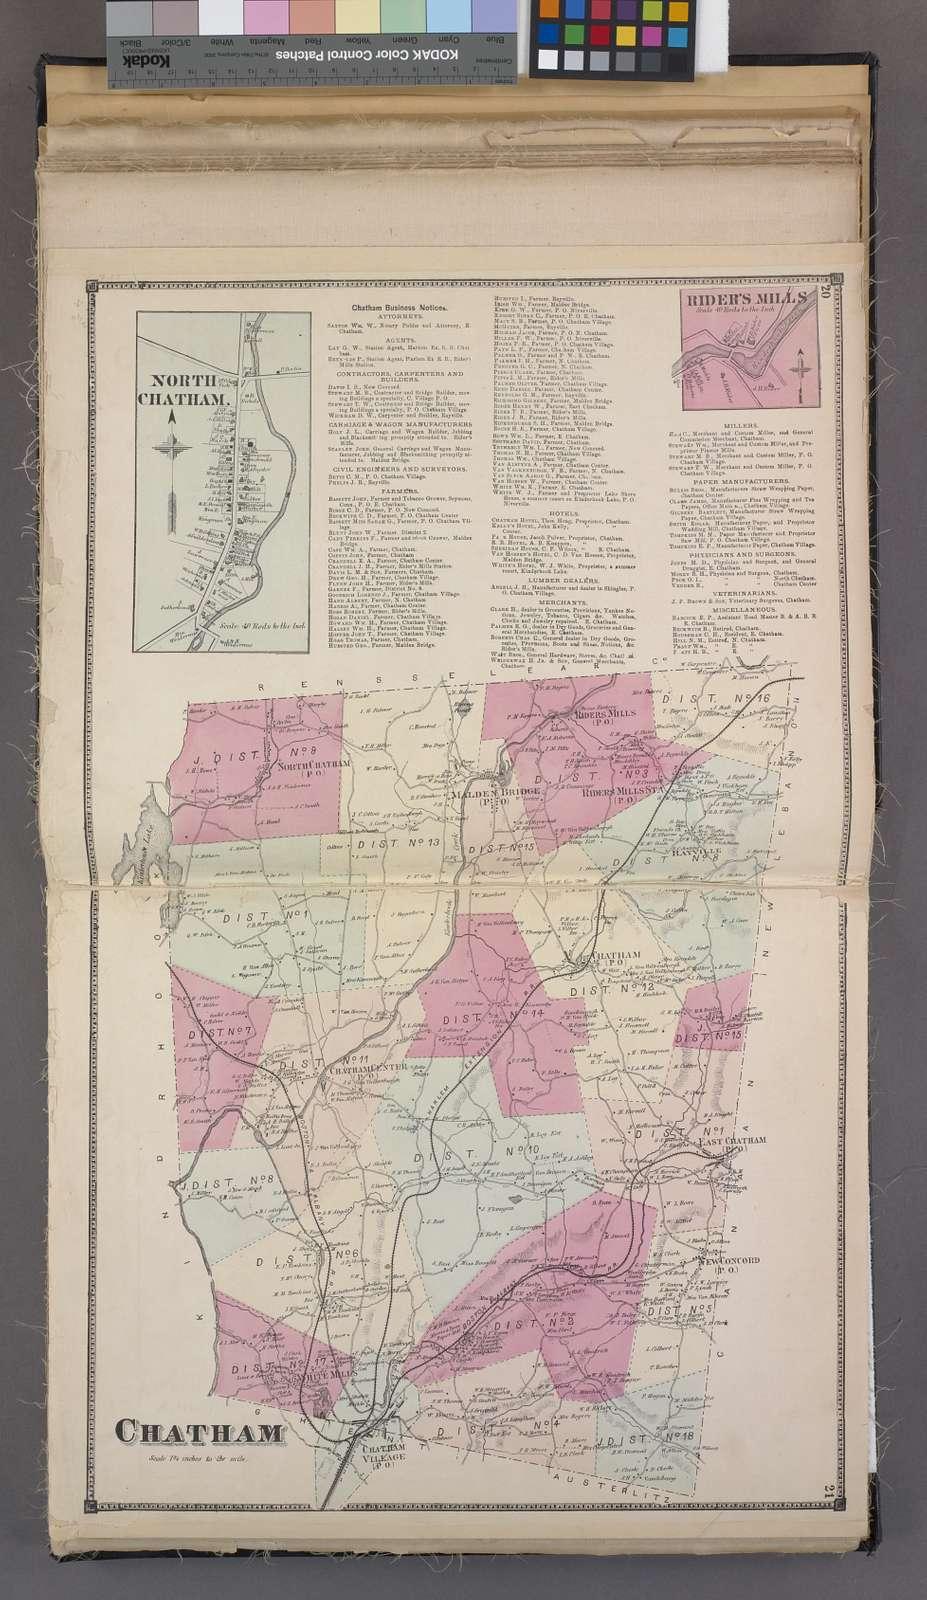 North Chatham. [Village]; Chatham Business Notices.; Ridder's Mills [Village]; Chatham [Township]